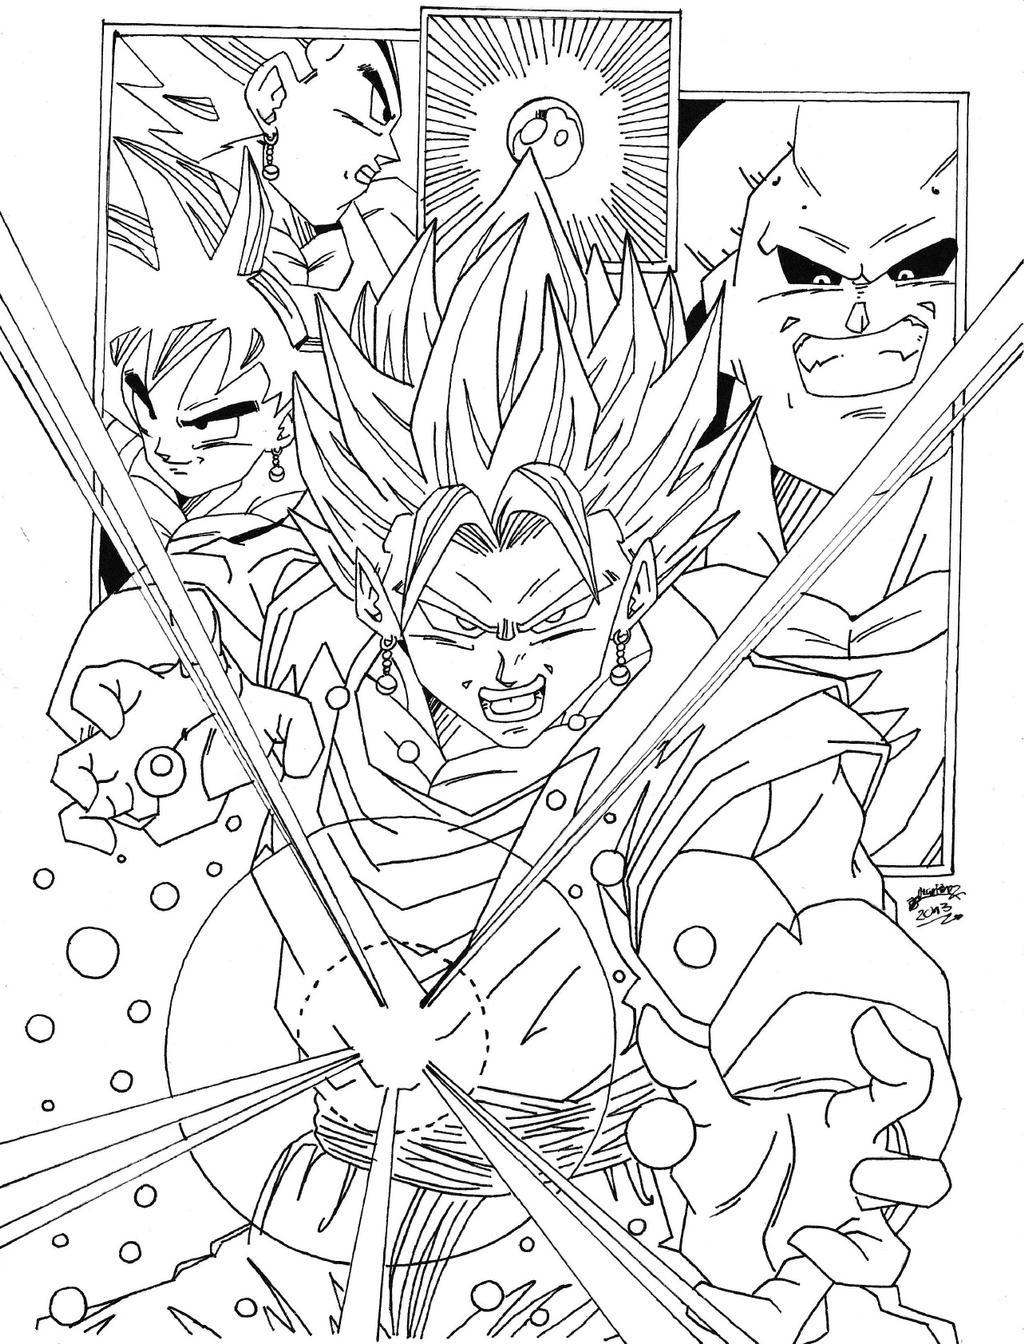 Dragon Ball Z Lineart : Dragonball z saga de buu lineart by triigun on deviantart